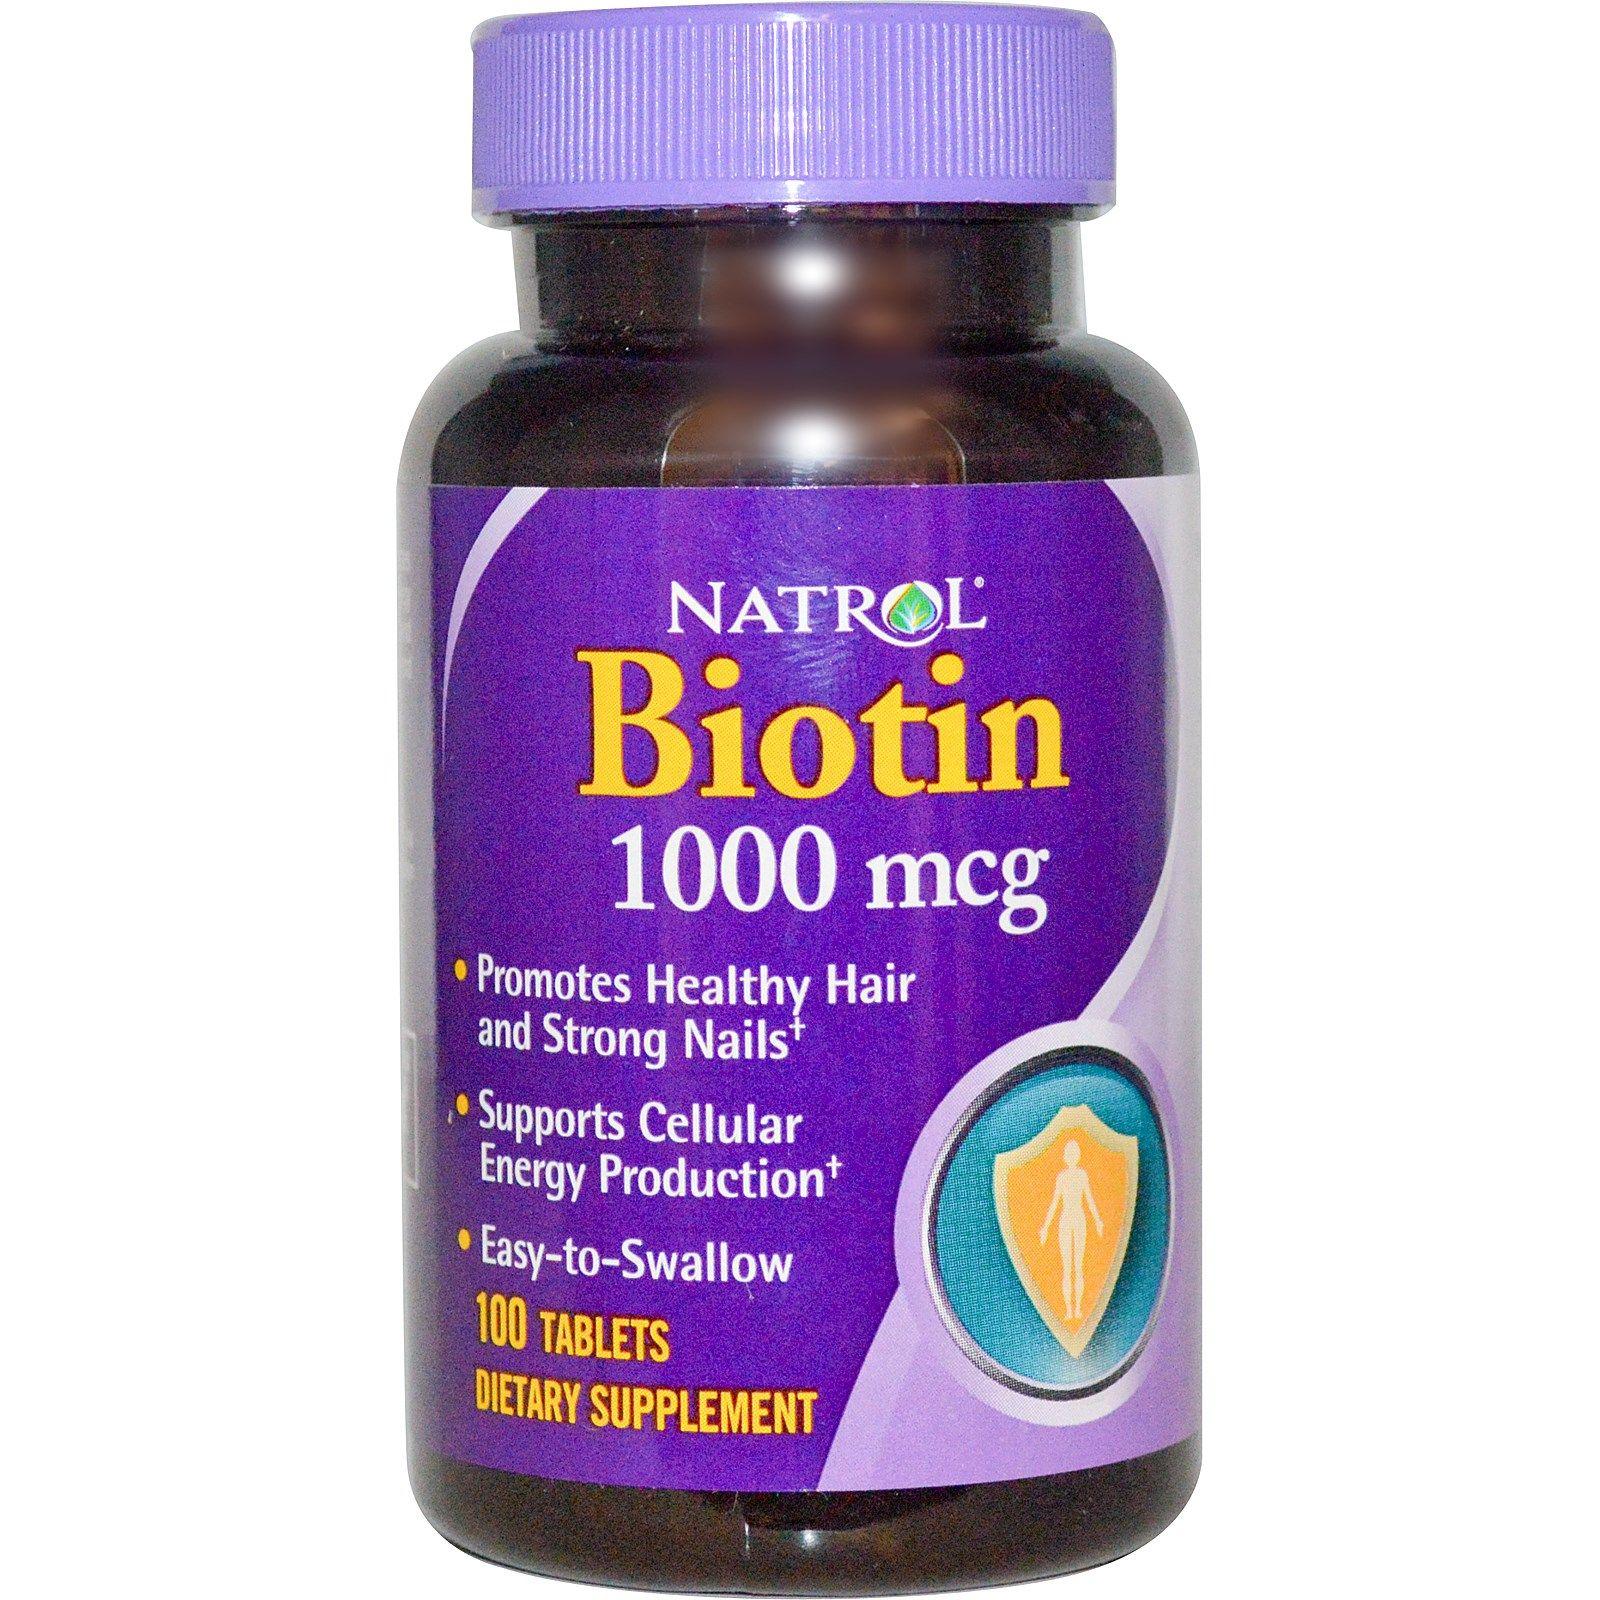 Natrol Biotin 1000 mcg